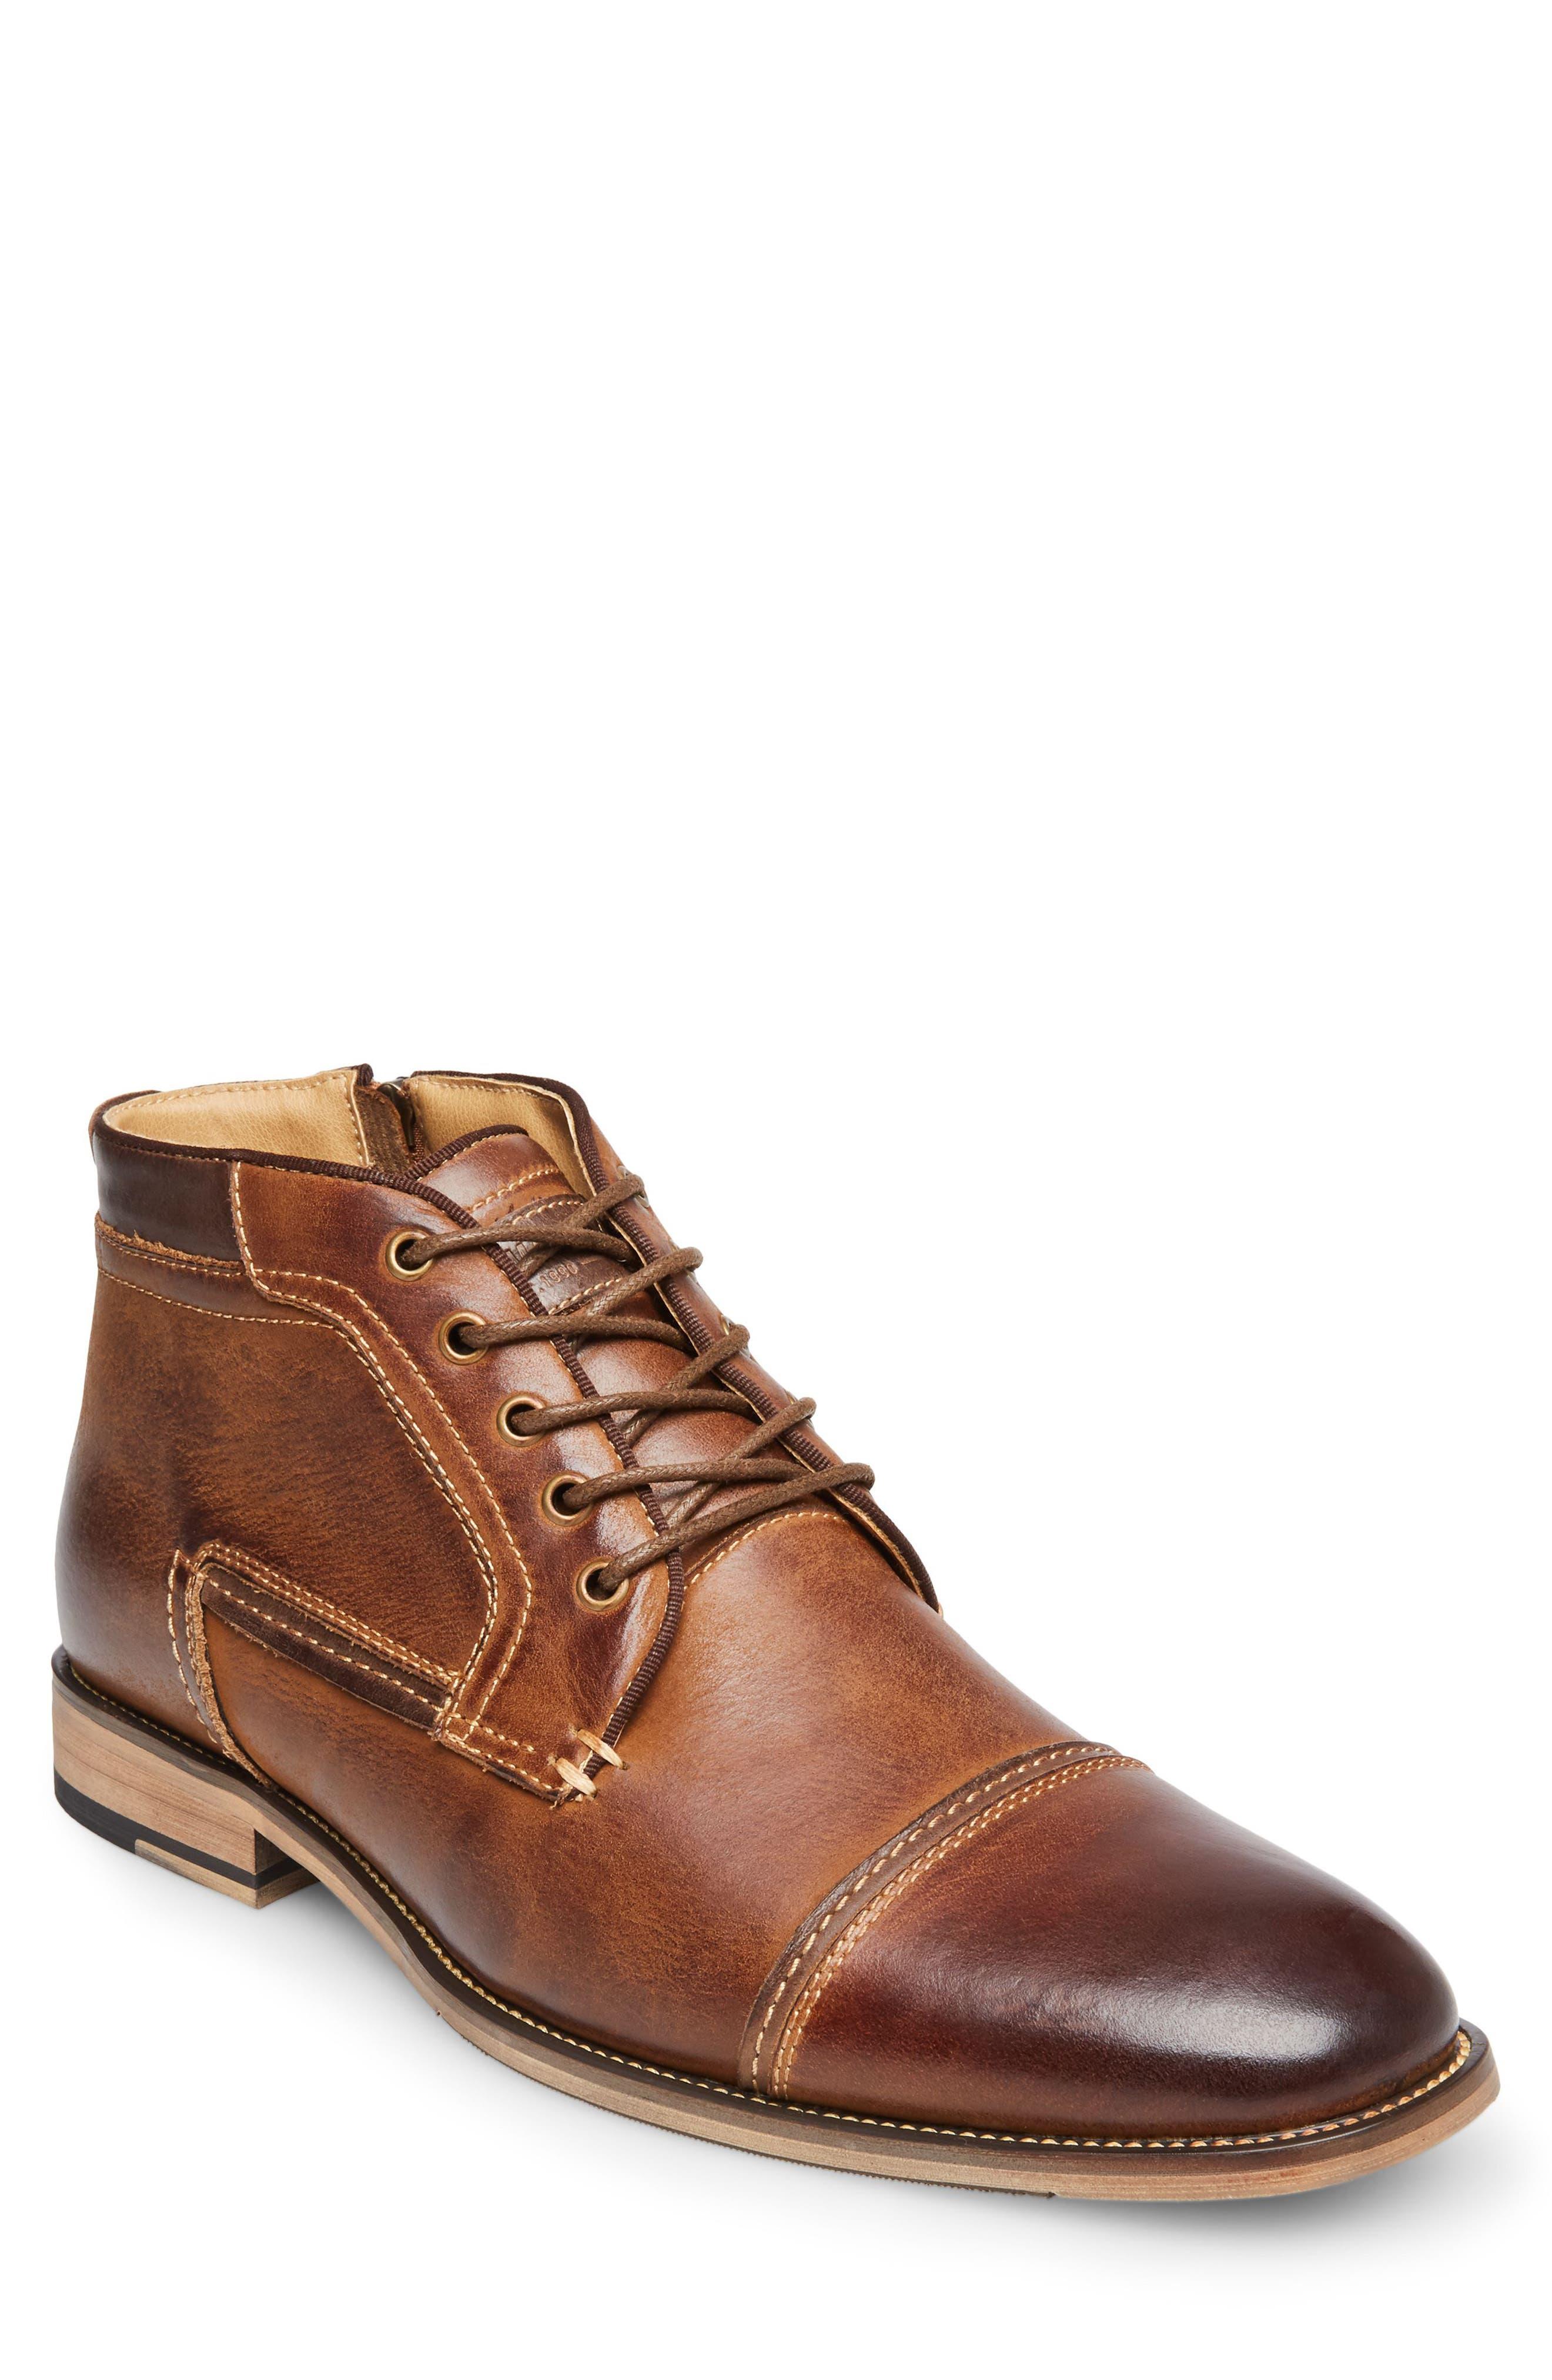 Alternate Image 1 Selected - Steve Madden Joyce Cap Toe Boot (Men)